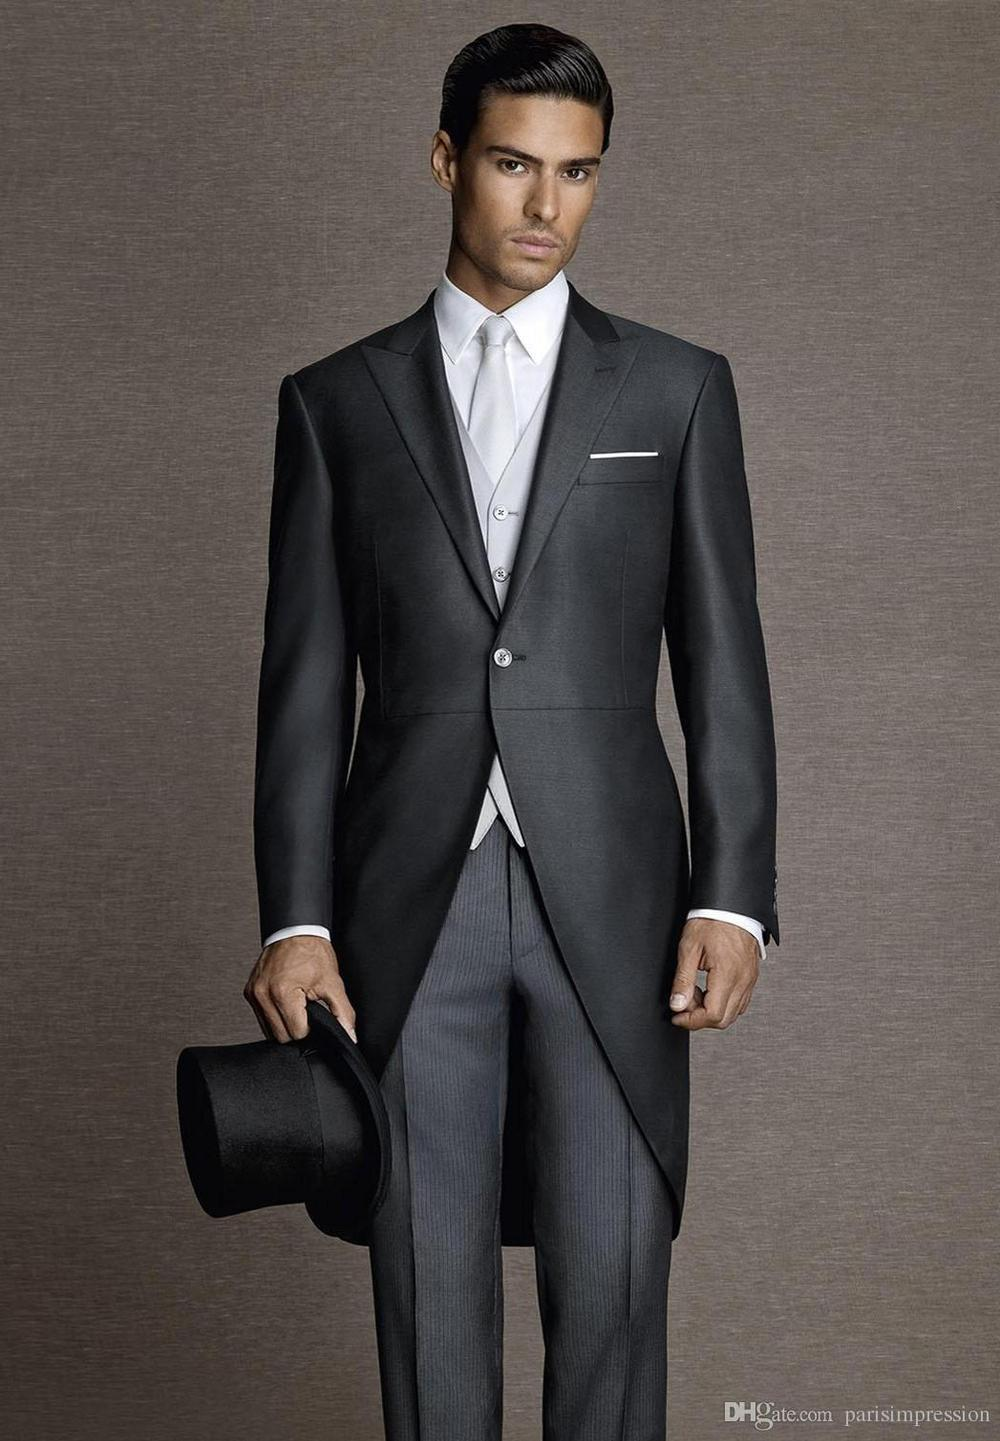 New Arrival Vintage Black Men Tailcoats Peaked Lapel Wedding Suits For Men Slim Fit Groomsmen Suits 3 Pieces Men Wedding Suits